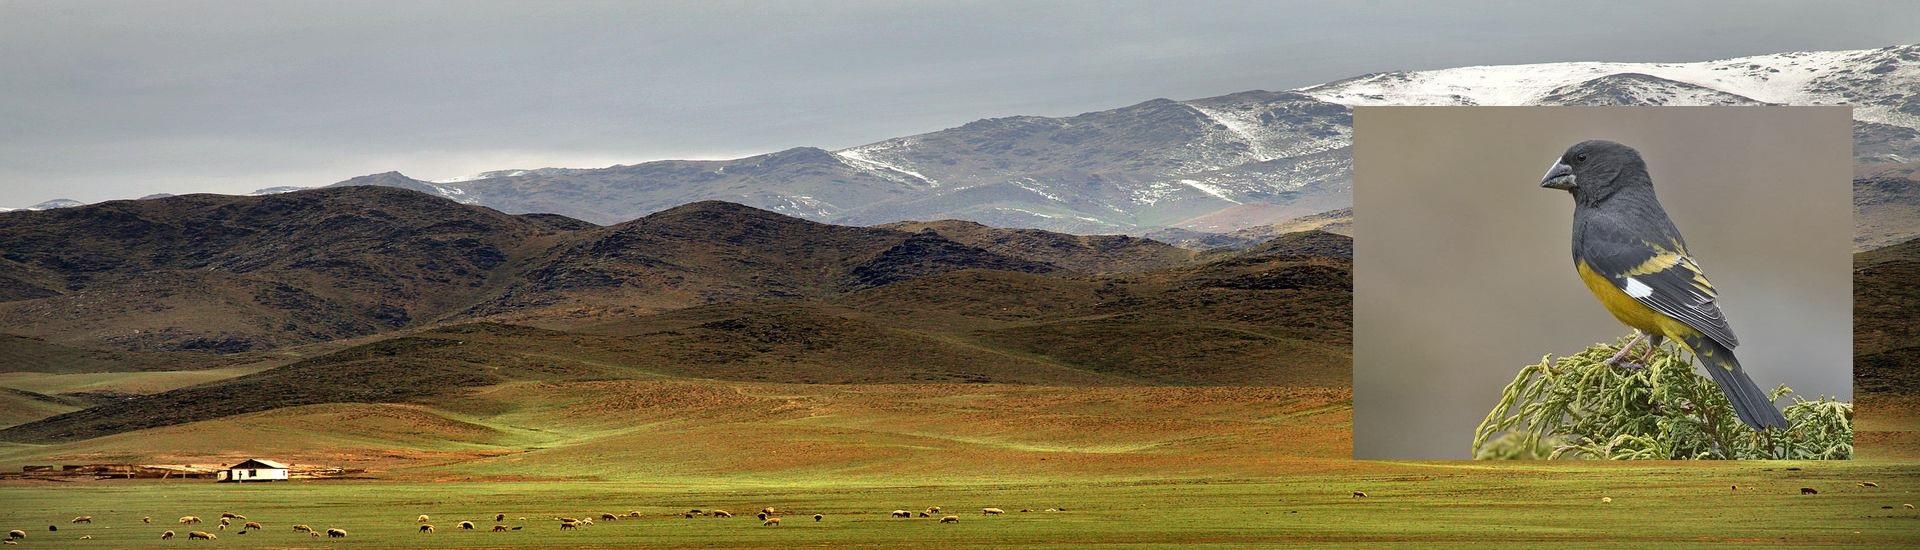 Stepy i góry Kazachstanu